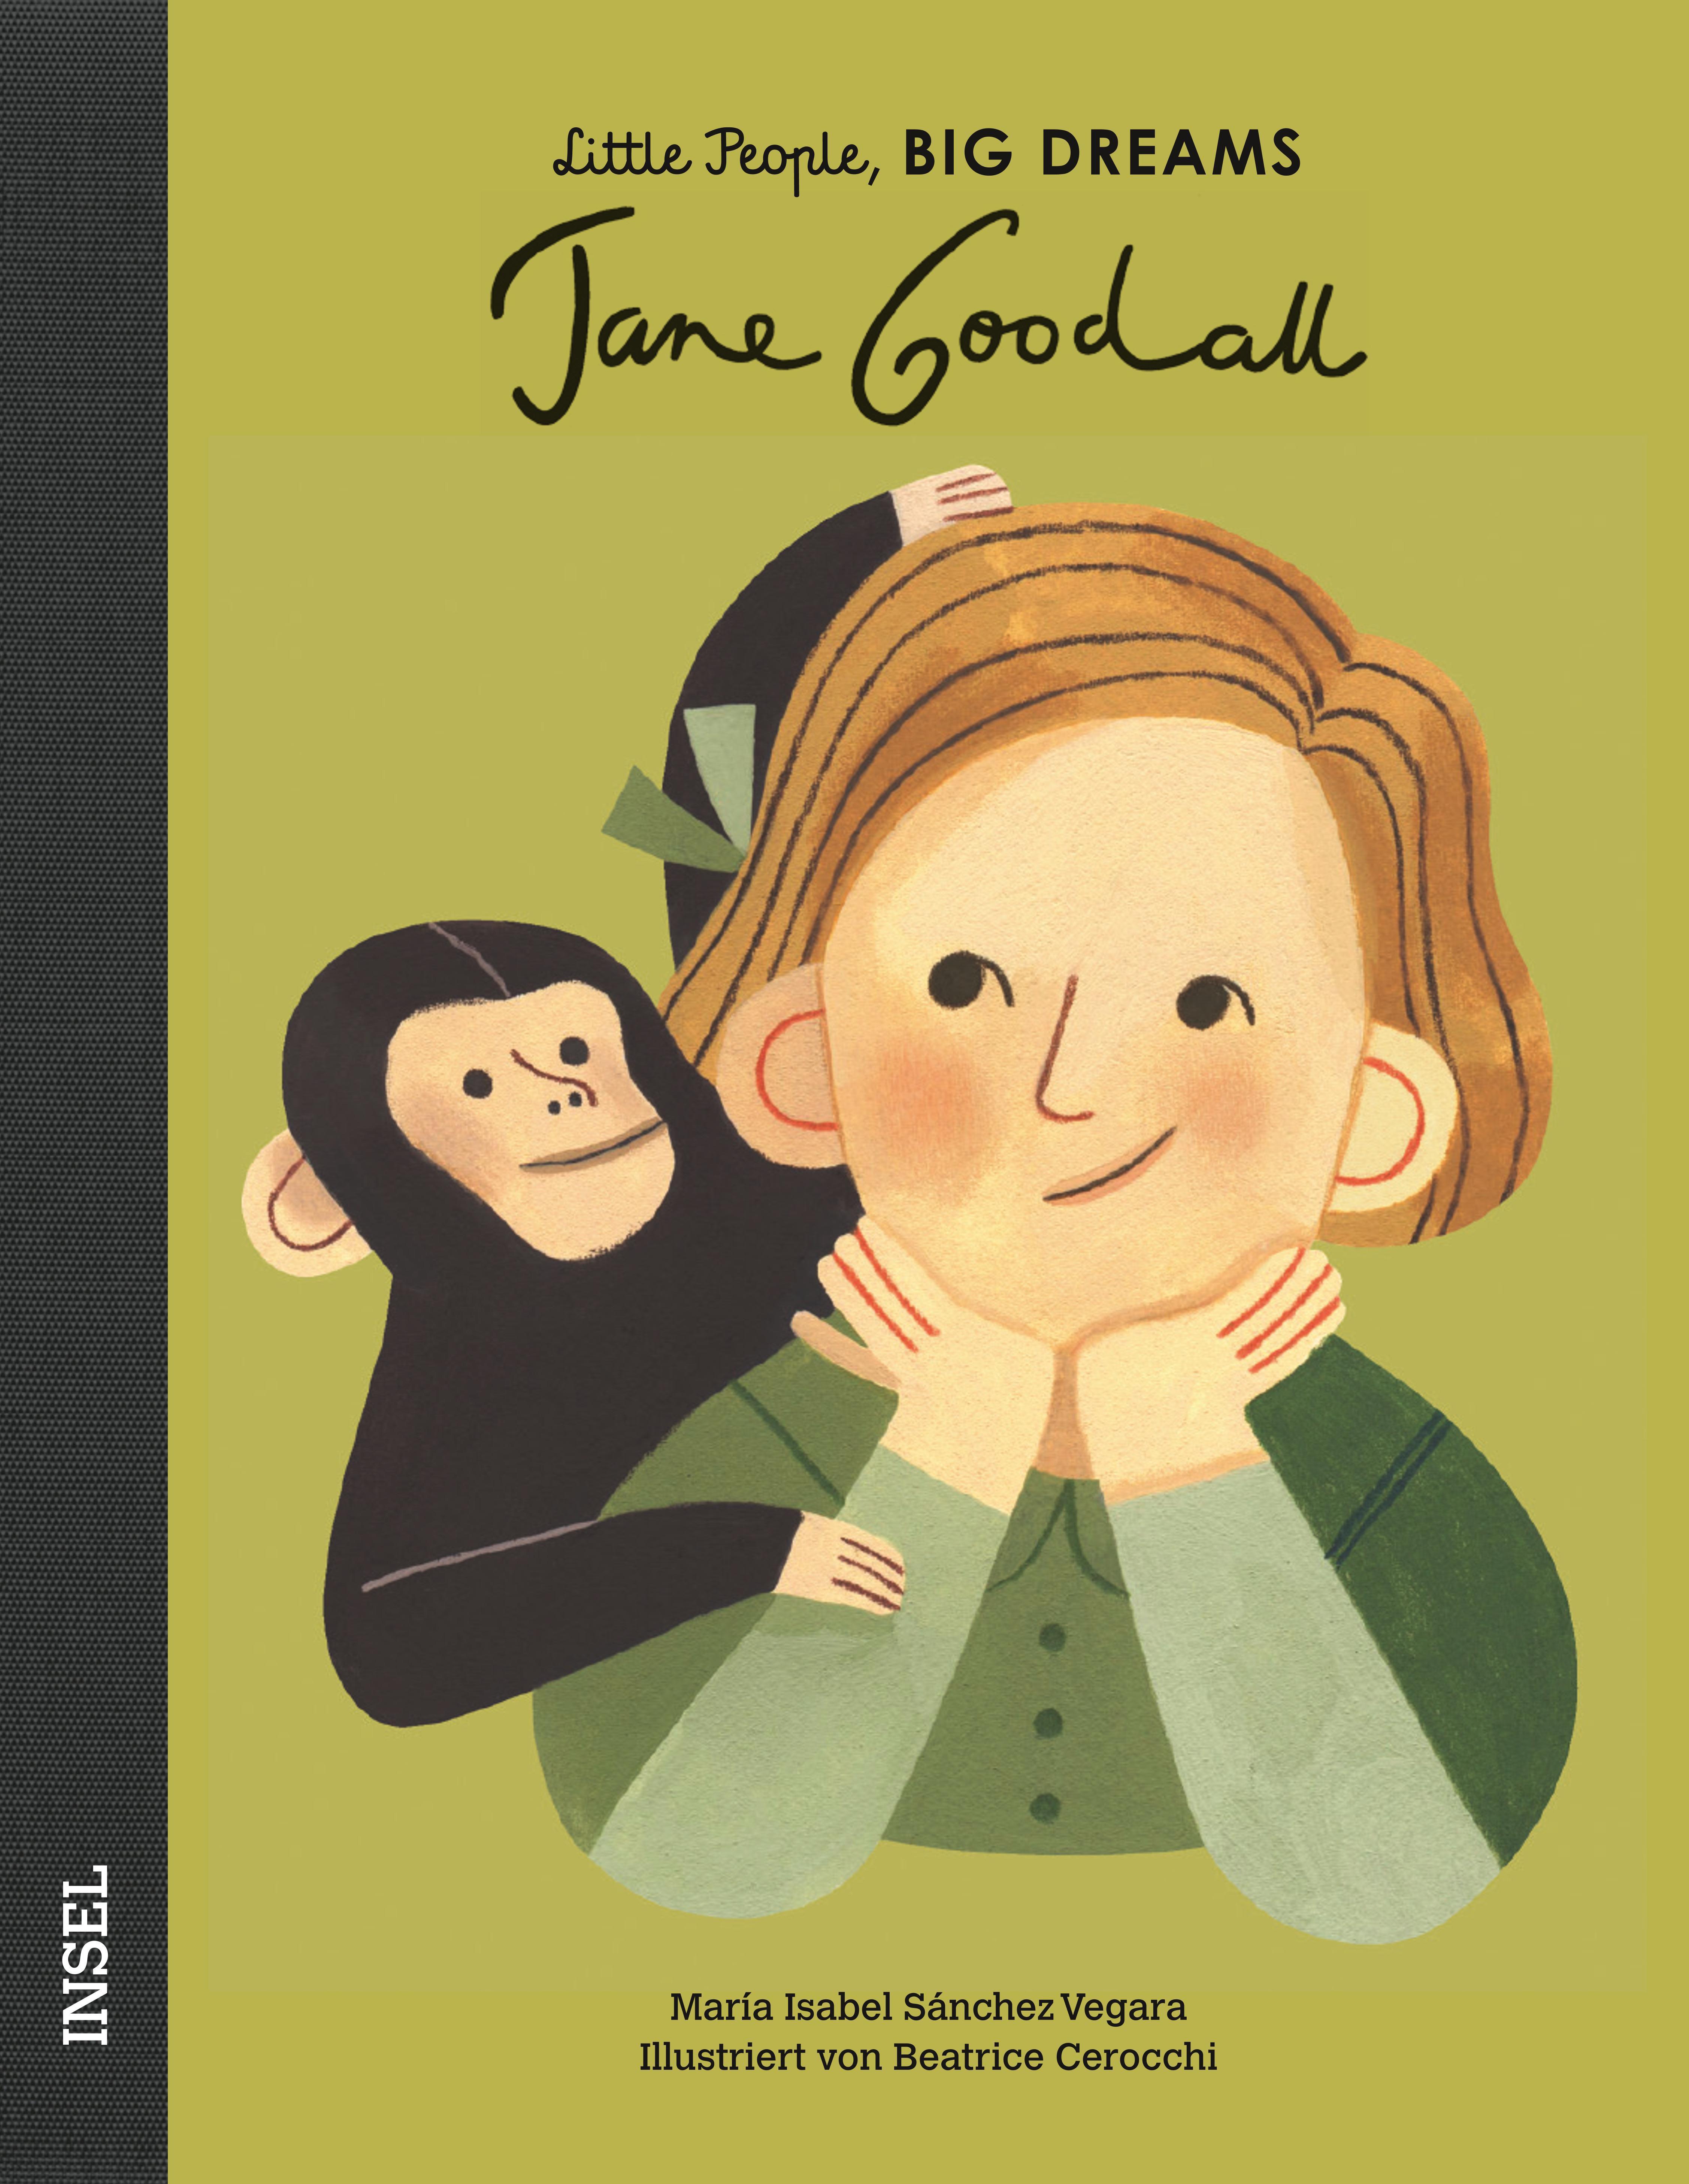 Little People, BIG DREAMS - Jane Goodall